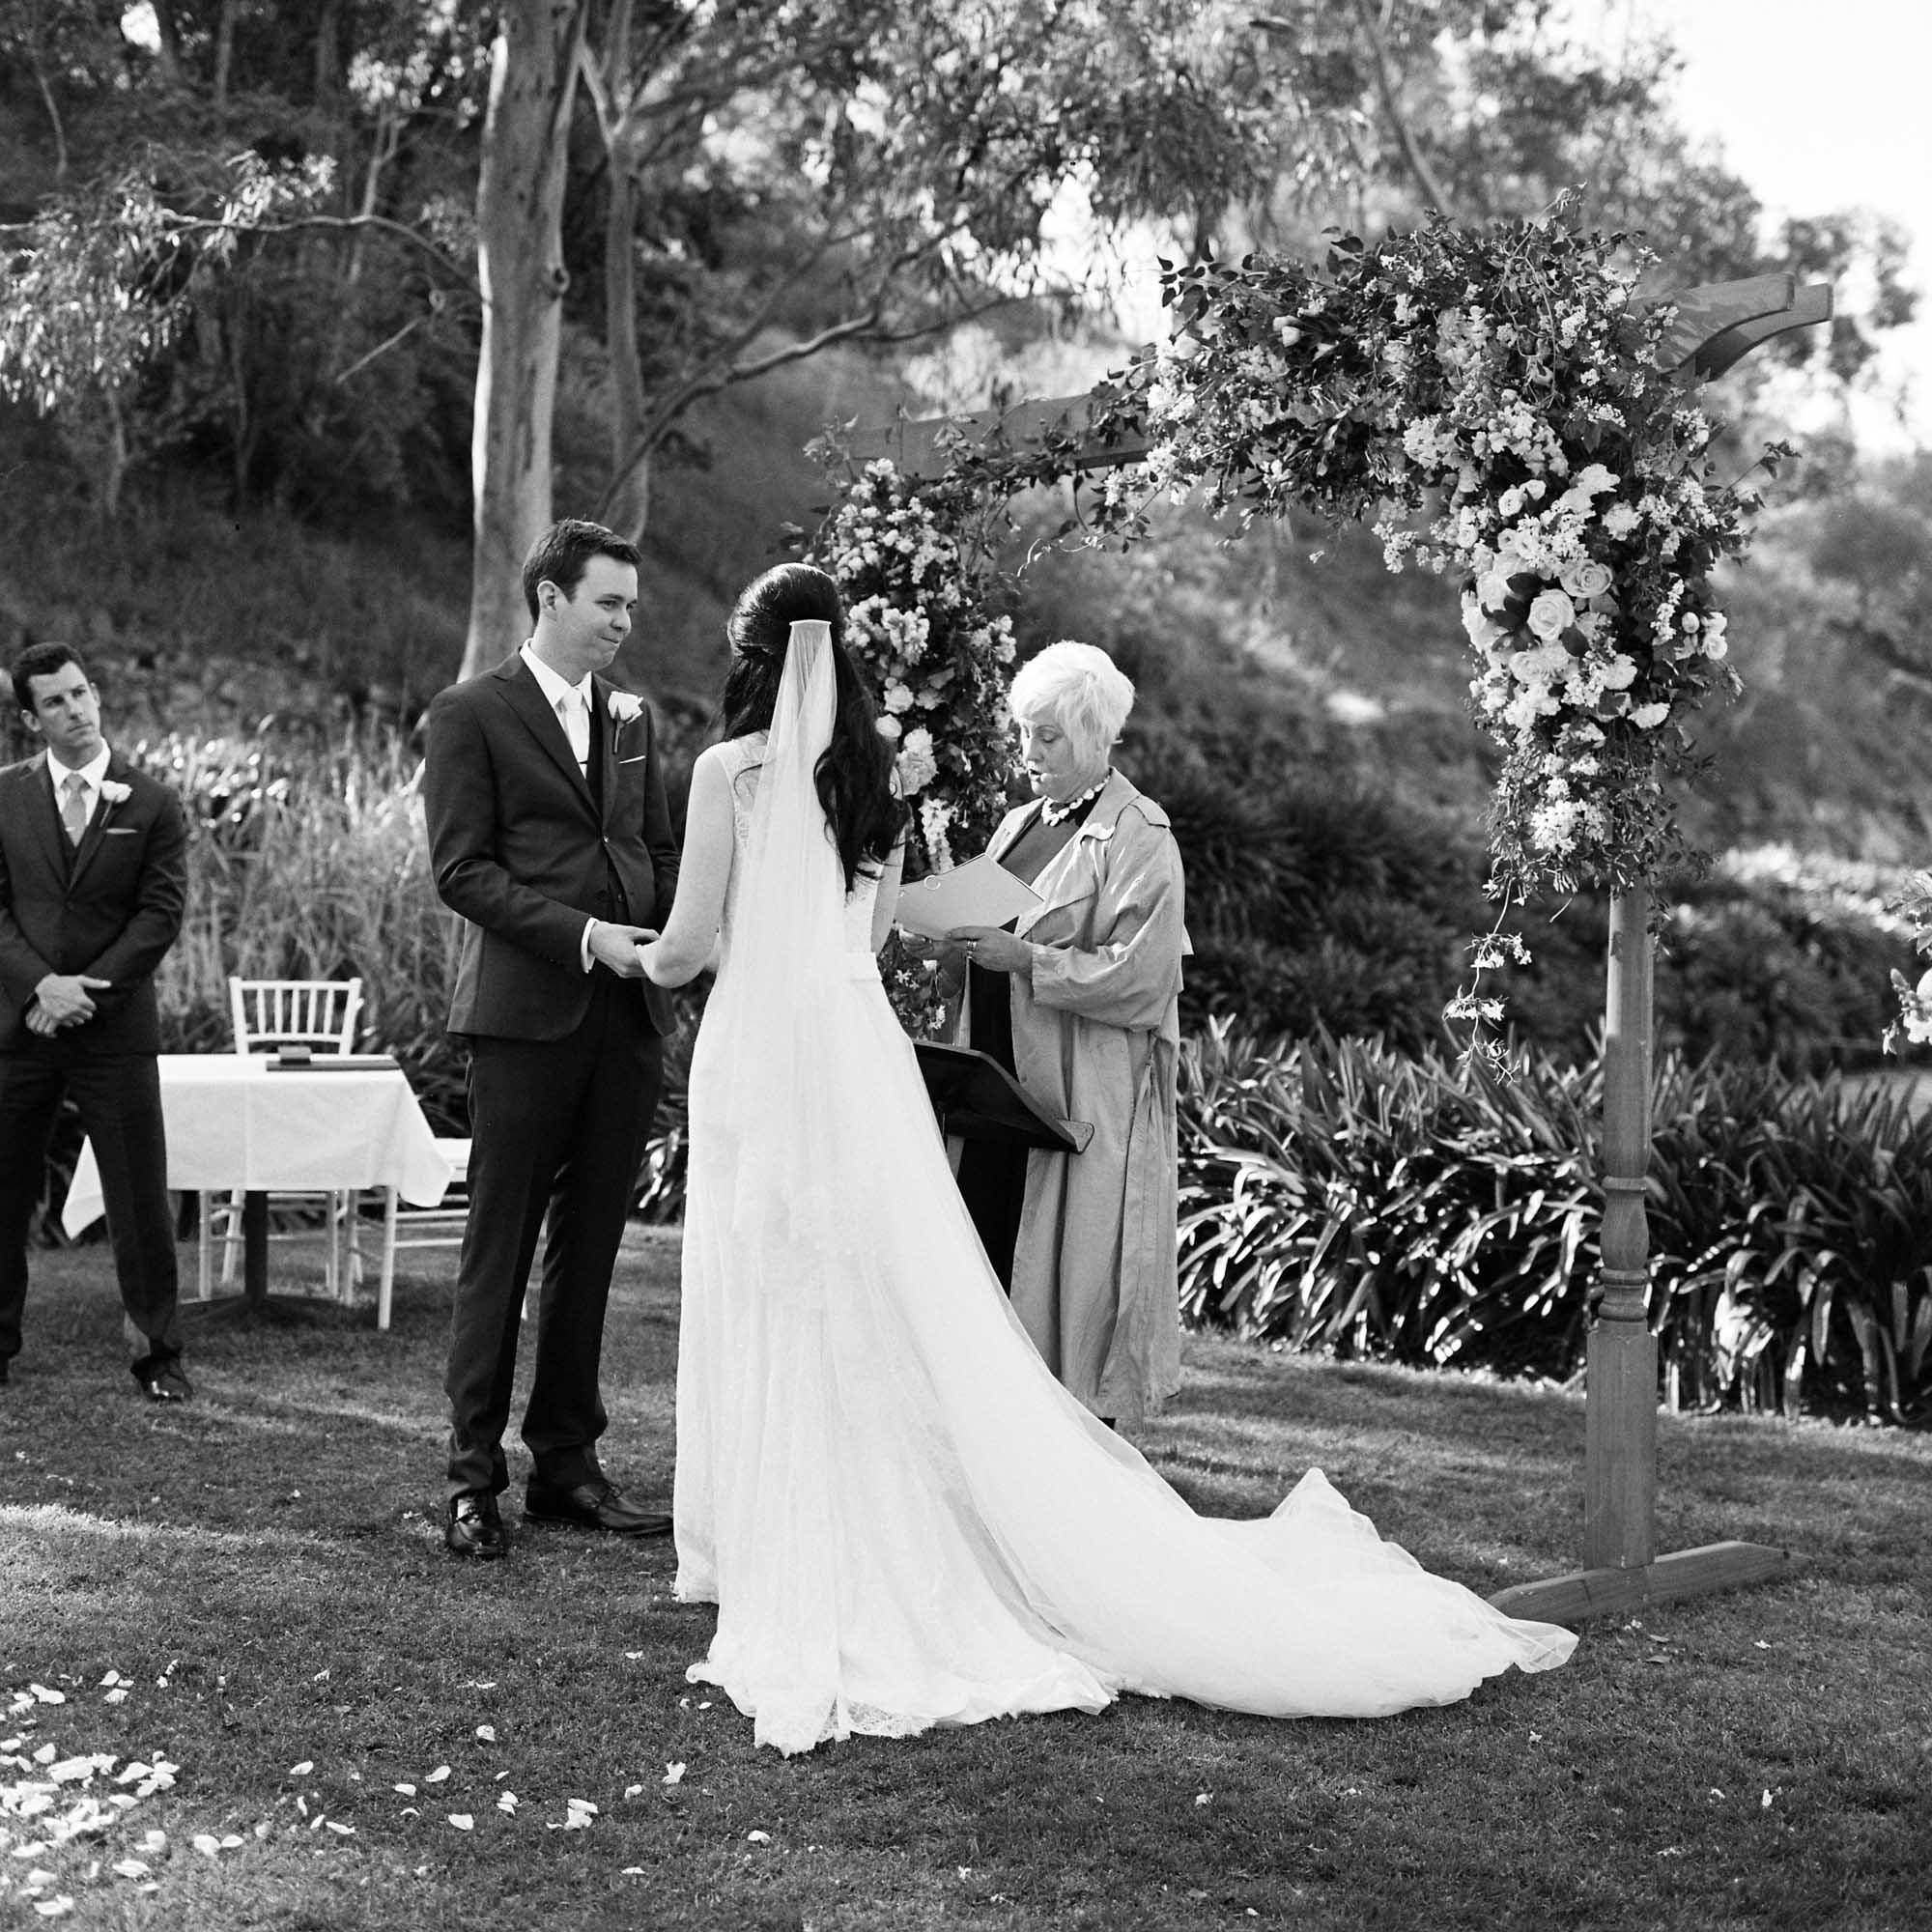 Glen-Ewin-Estate-wedding-photography-038.jpg